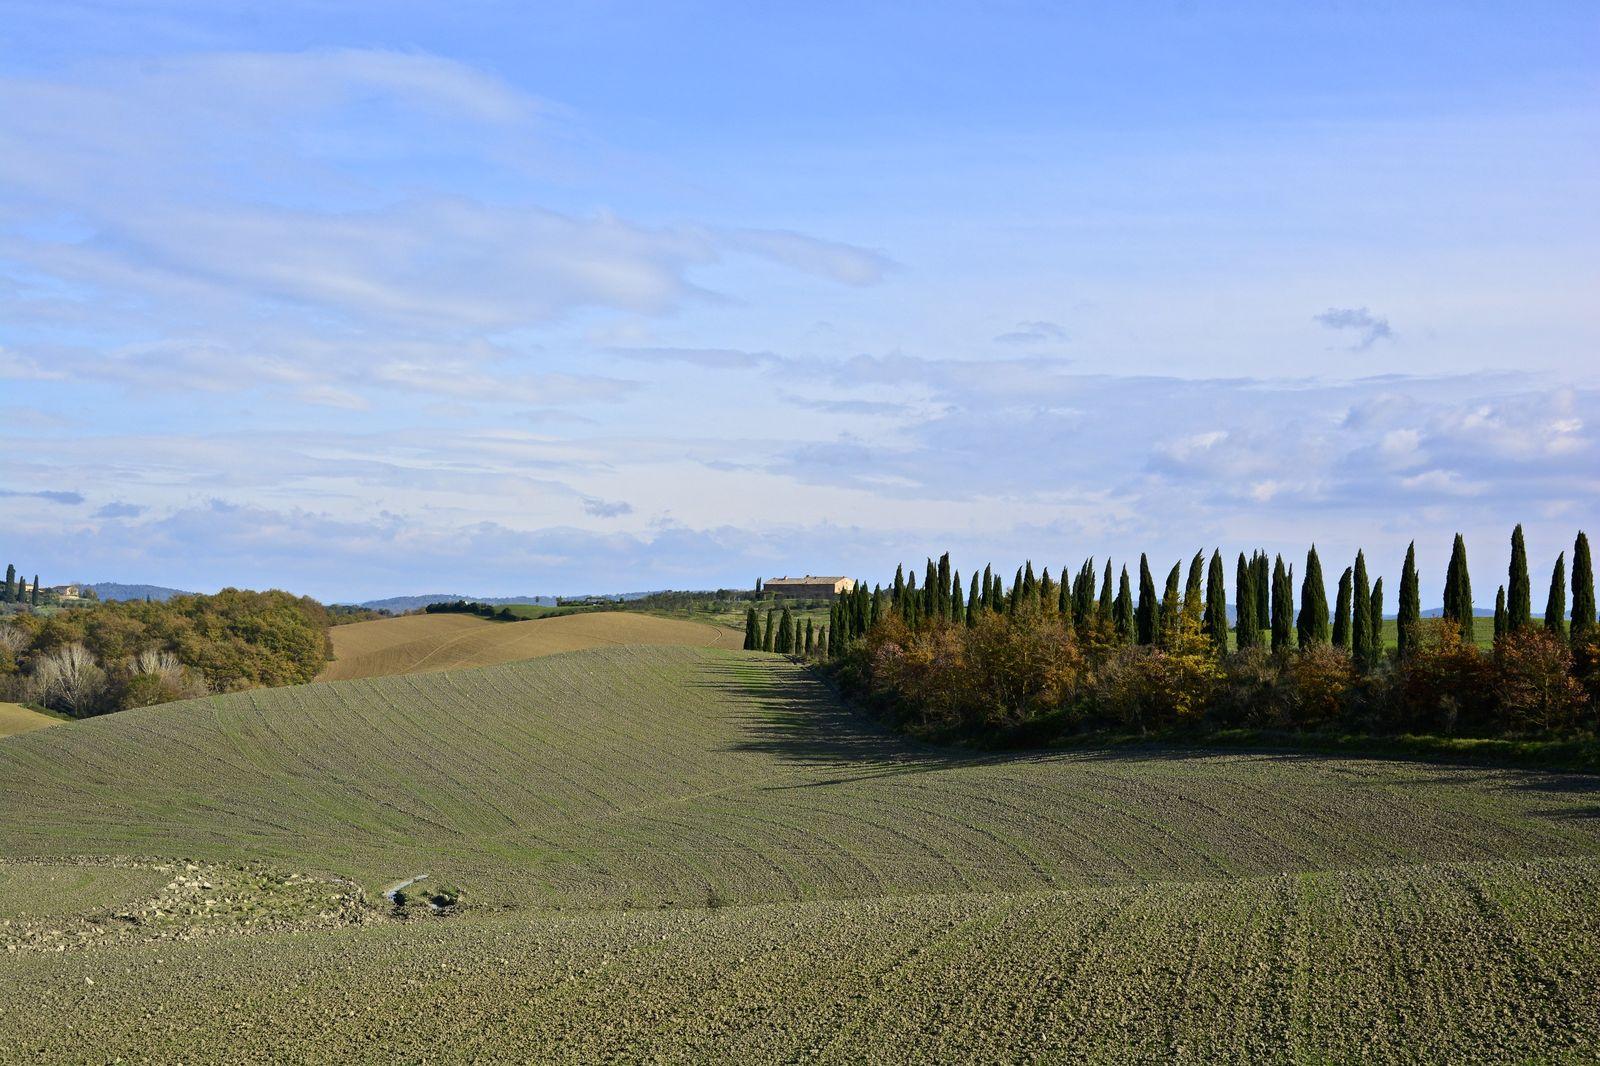 Castelnuovo Berardenga - An Open-Air Museum